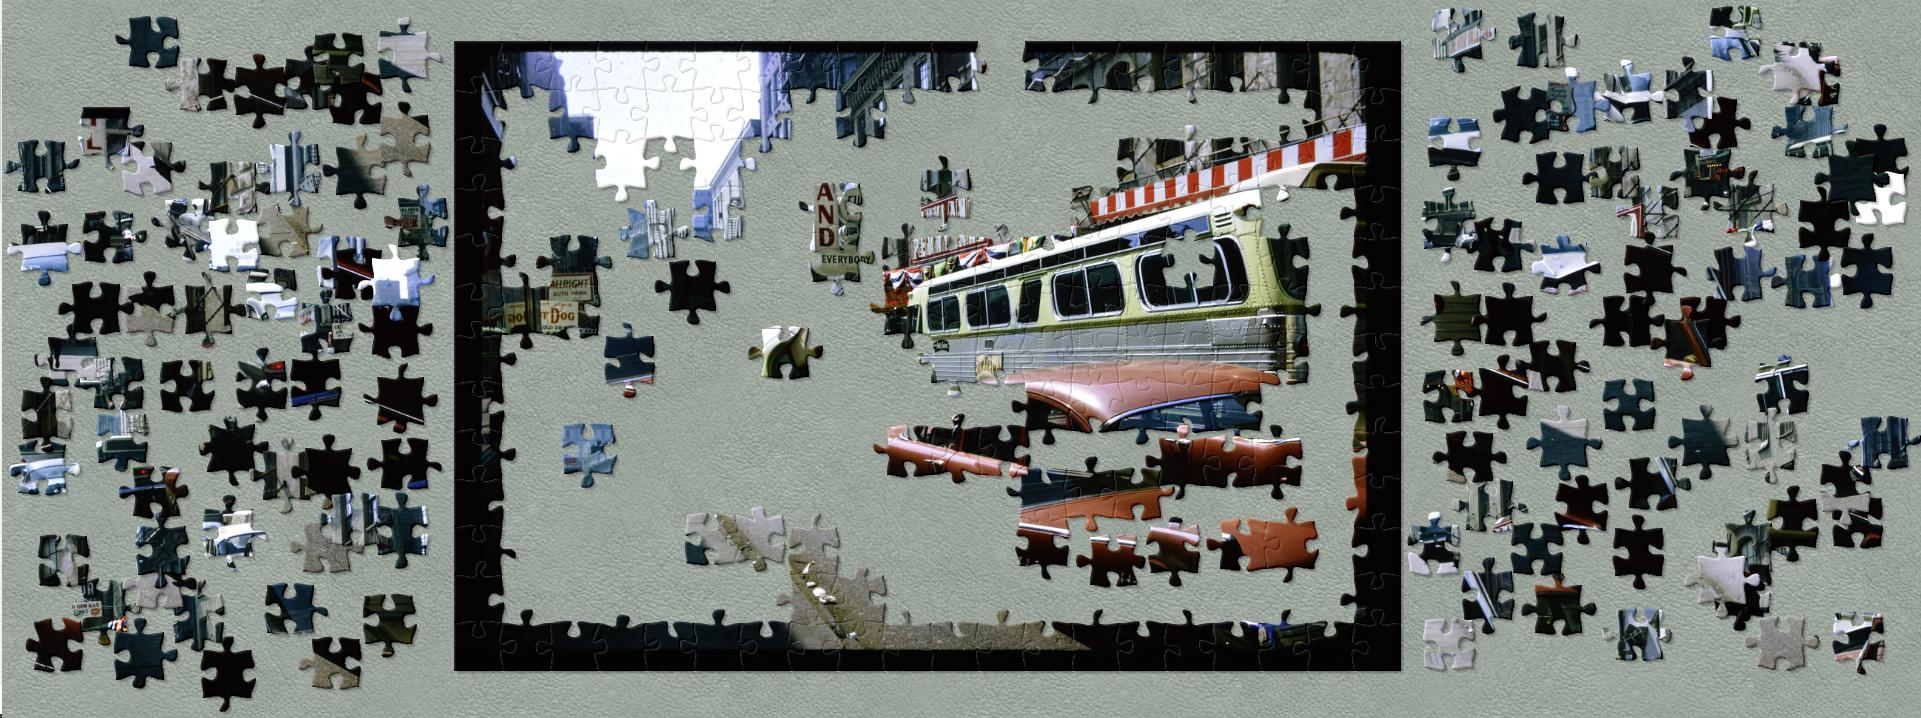 Virtual Puzzles